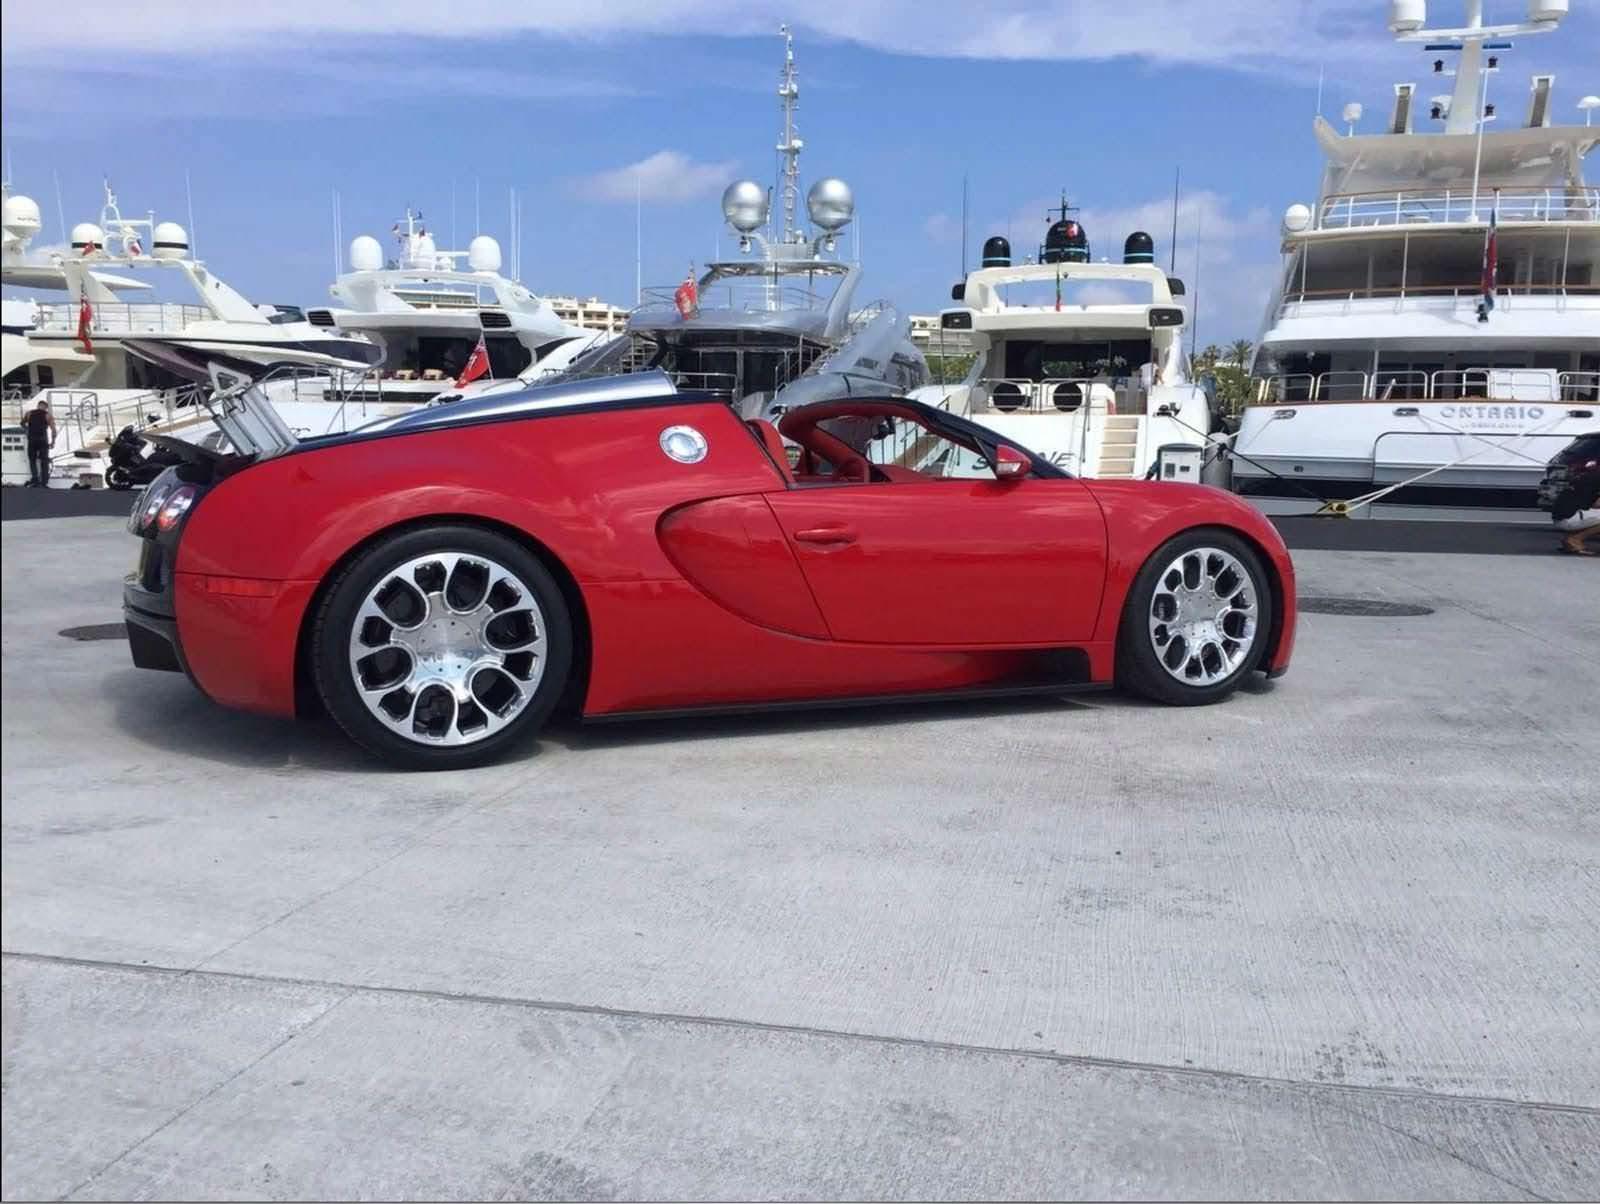 Bugatti Veyron Grand Sport 2009 года. Цена 1,5 млн евро